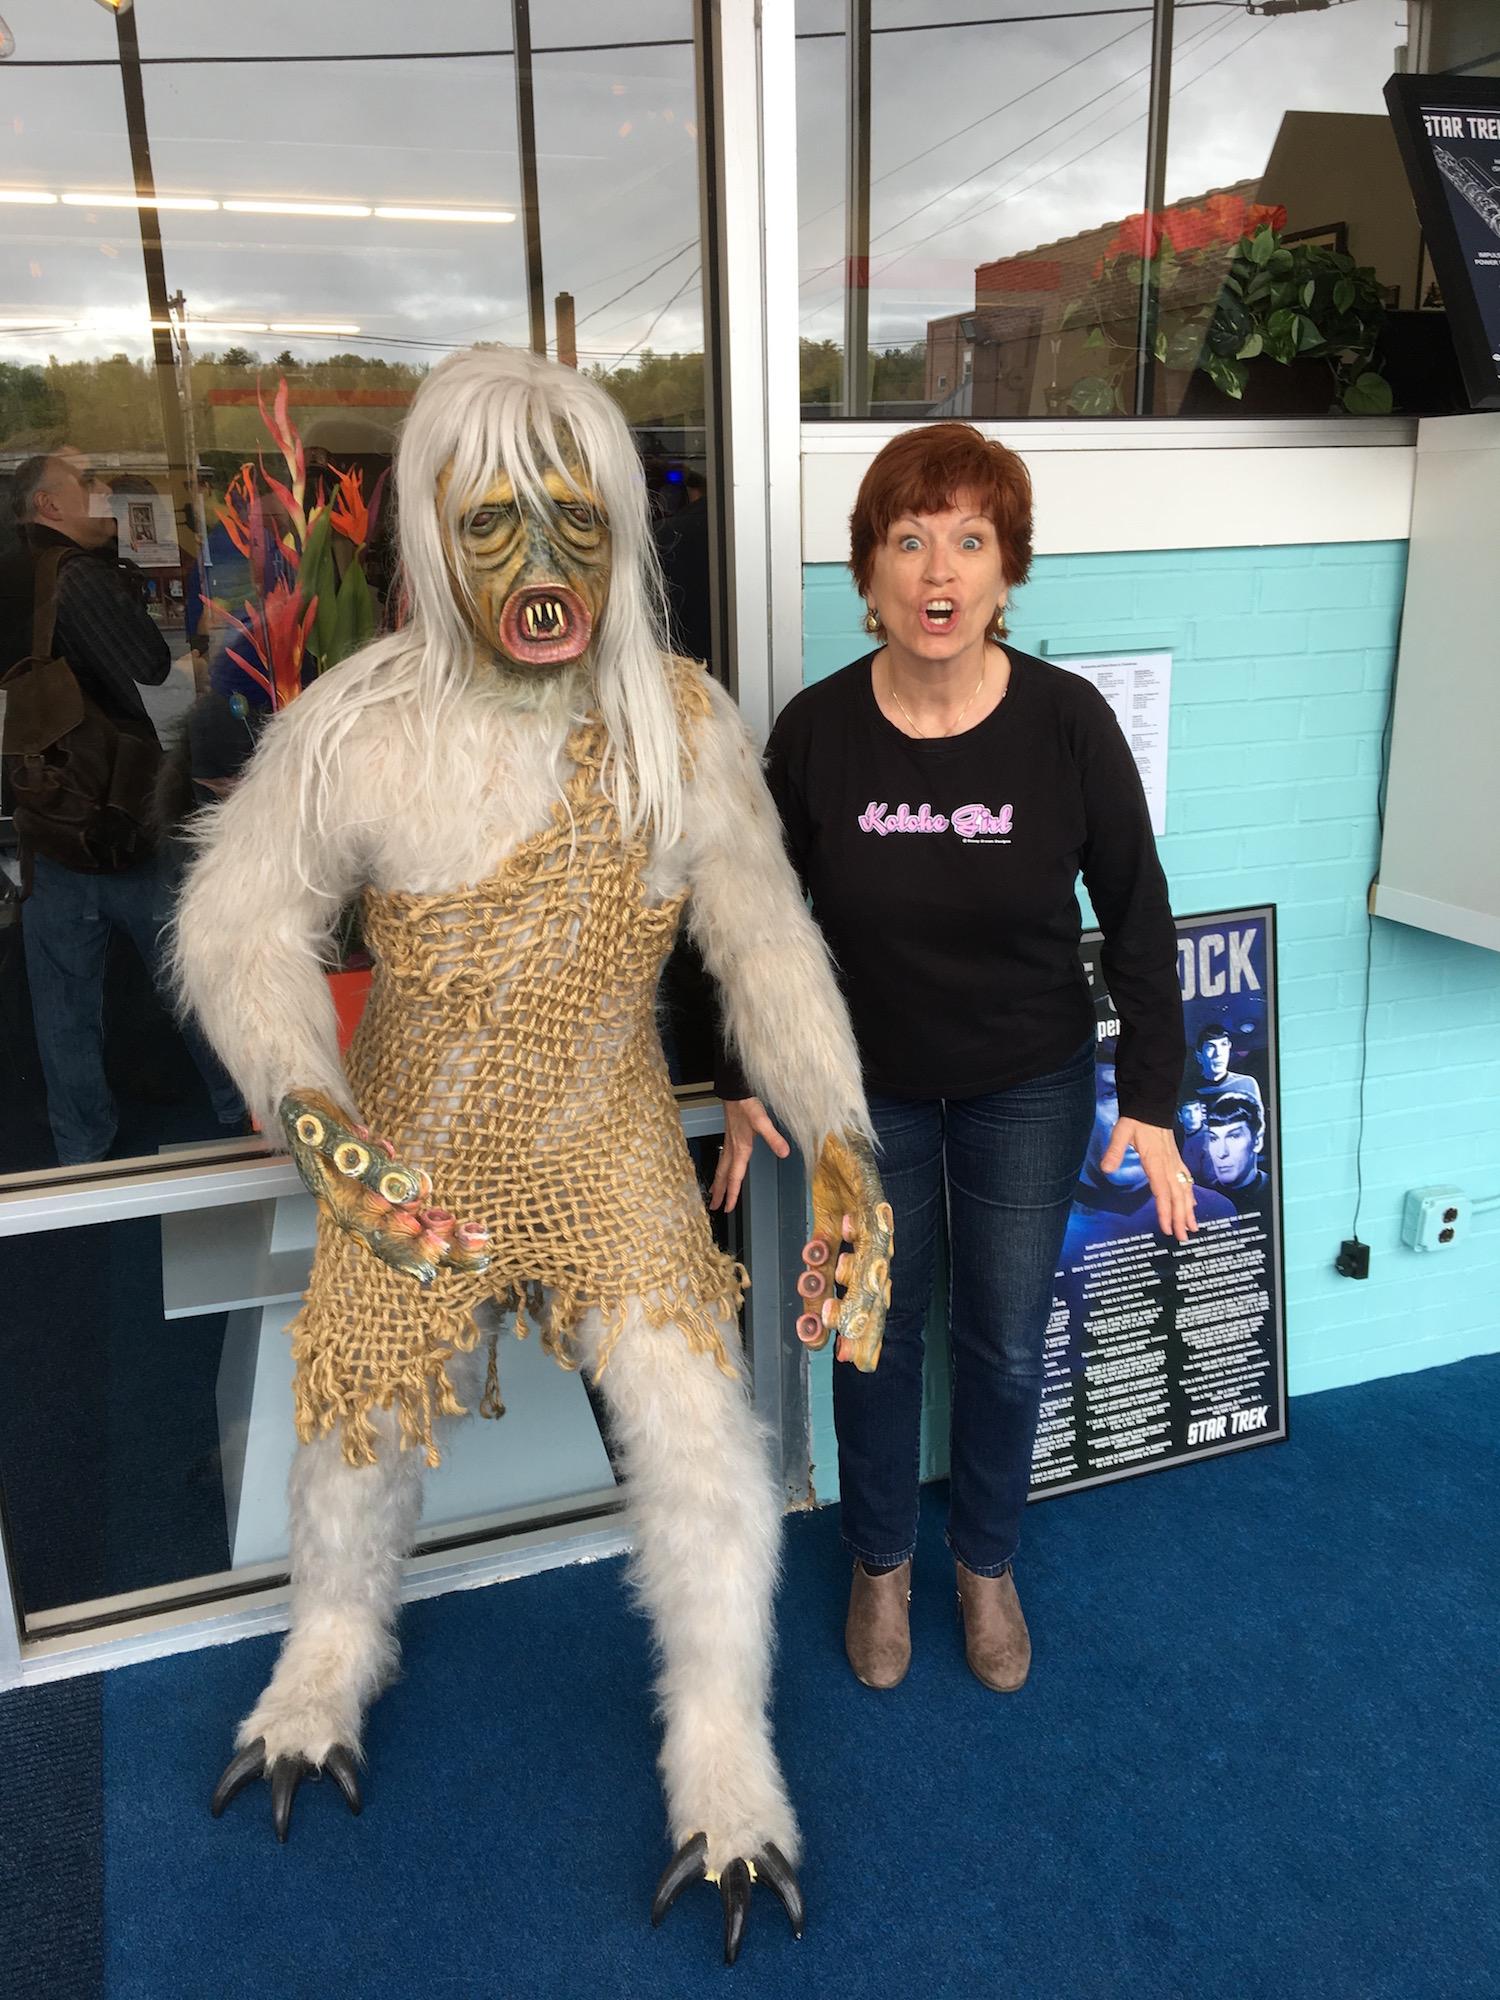 Karen Ragan-George Doing Her Best M-113 Creature Impersonation ©2017 David R. George III